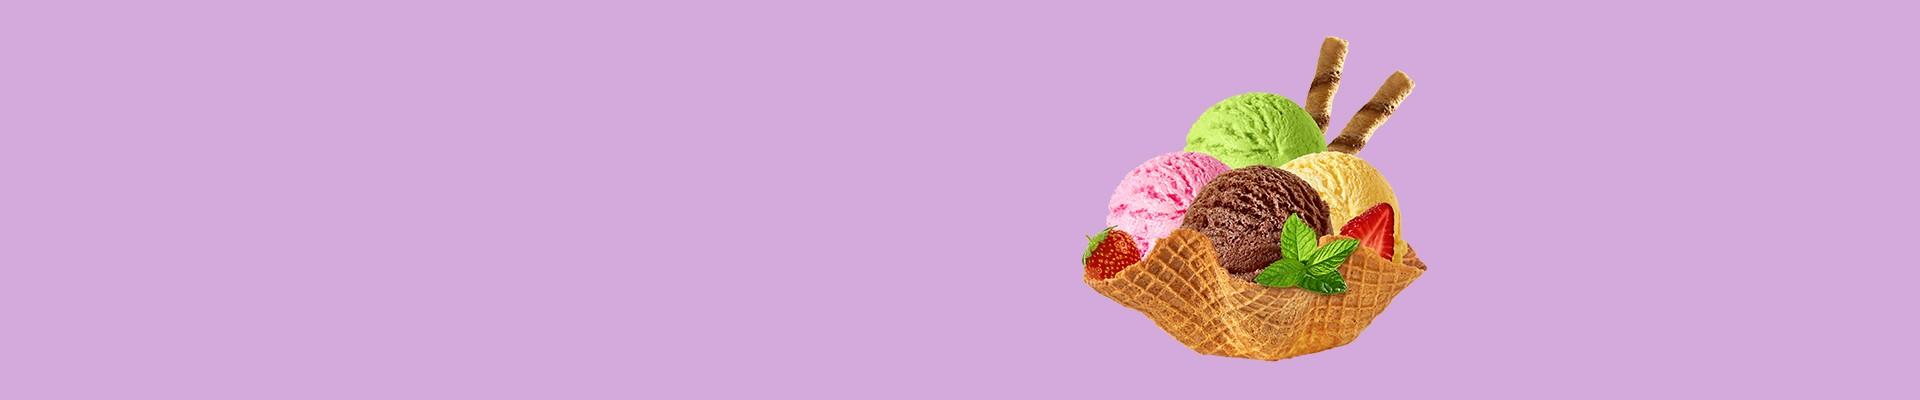 Jual Es Krim & Dessert Beku Berkualitas